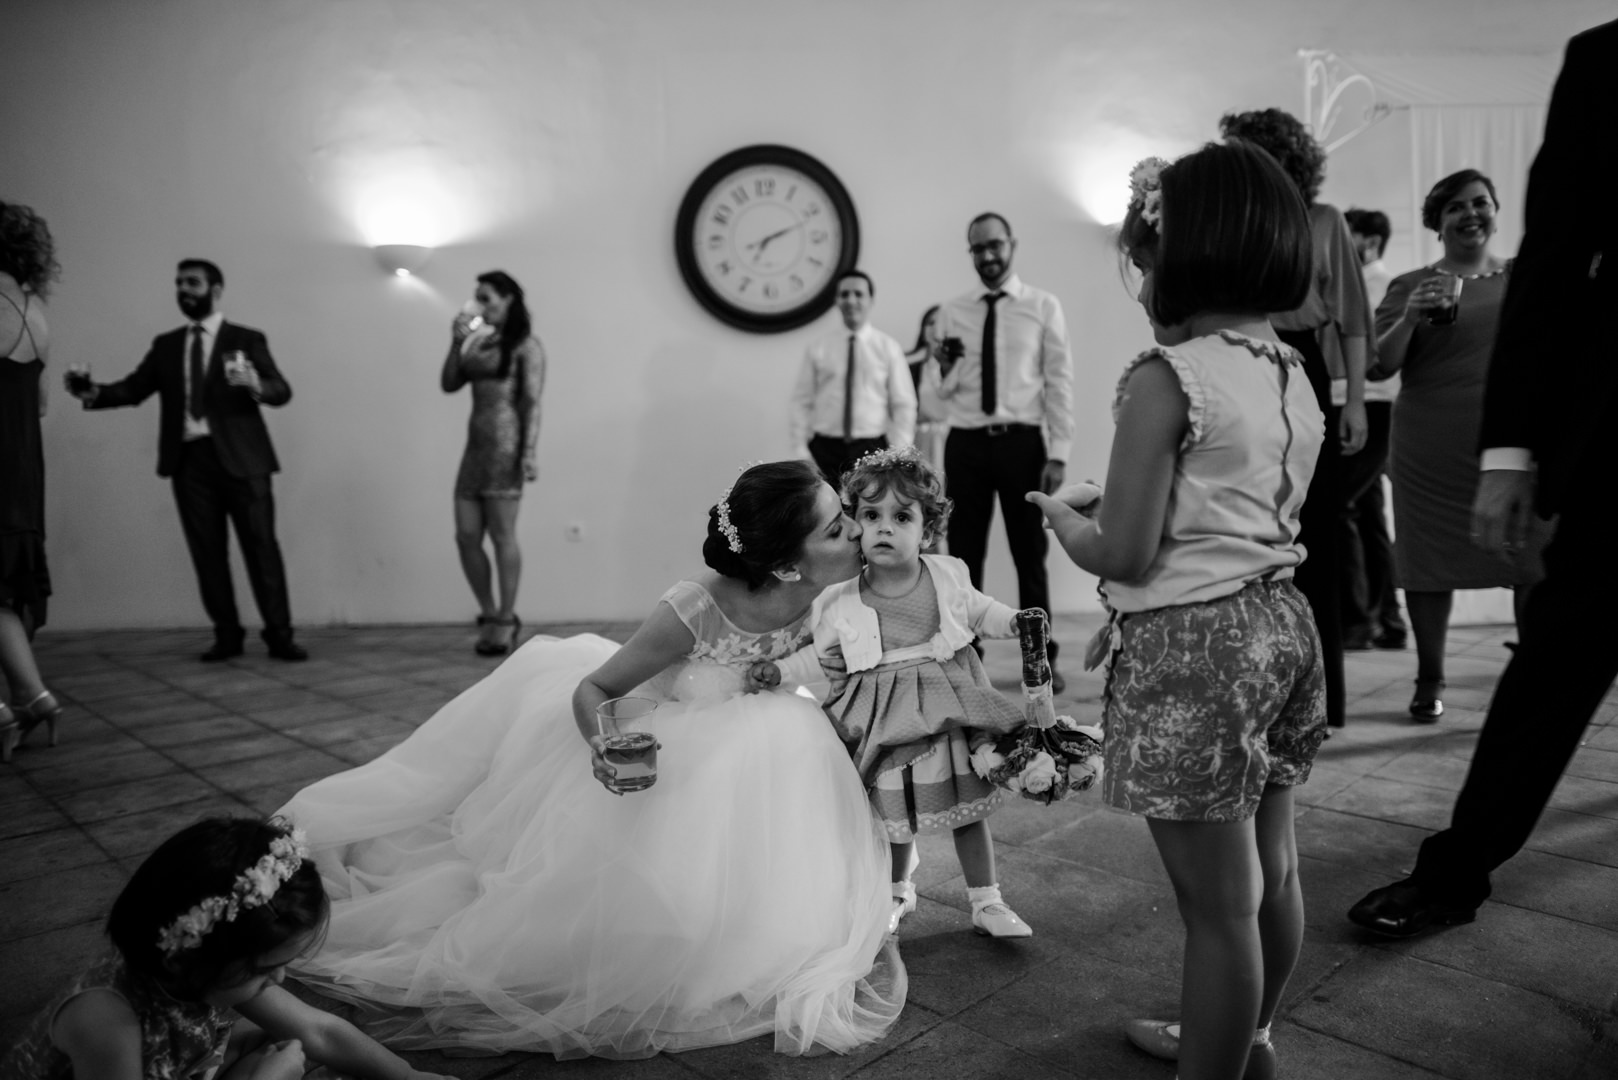 Boda-Hacienda-LOrigen-Pepe-Maria-engagement-Rafael-Torres-fotografo-bodas-sevilla-madrid-barcelona-wedding-photographer--32.jpg